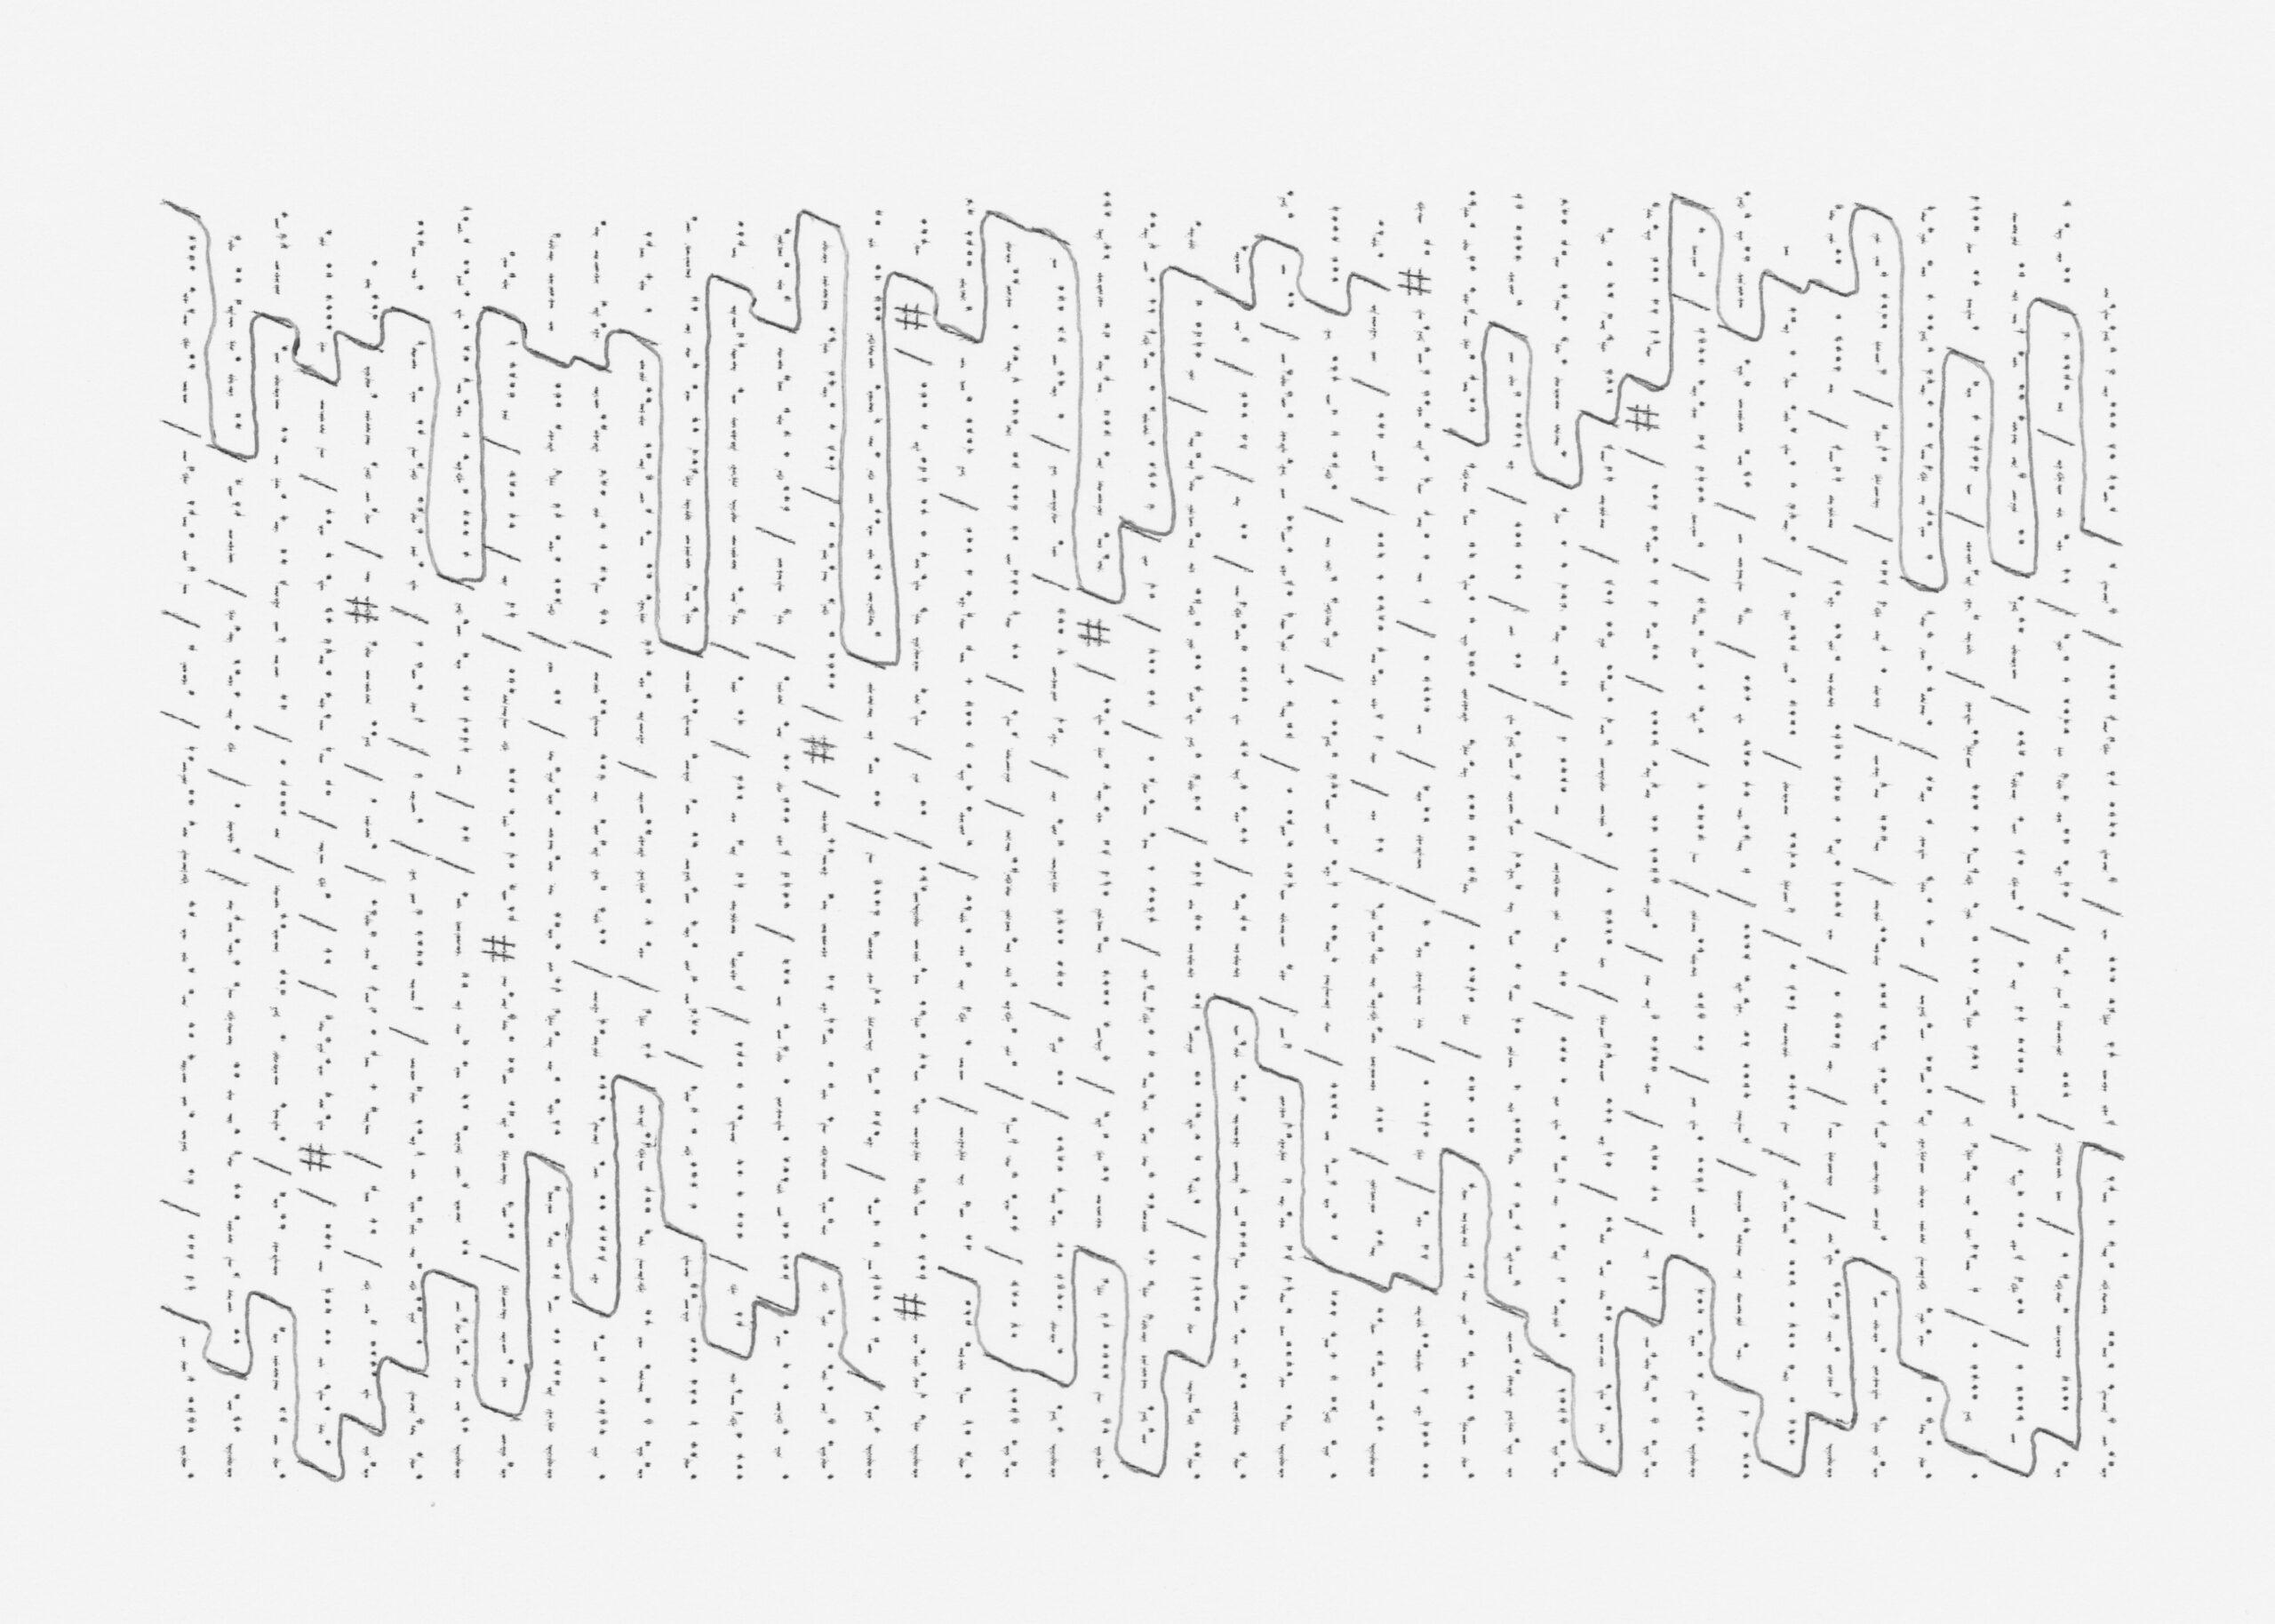 A_2020_04_23_scans_total_morseknittingScan-2